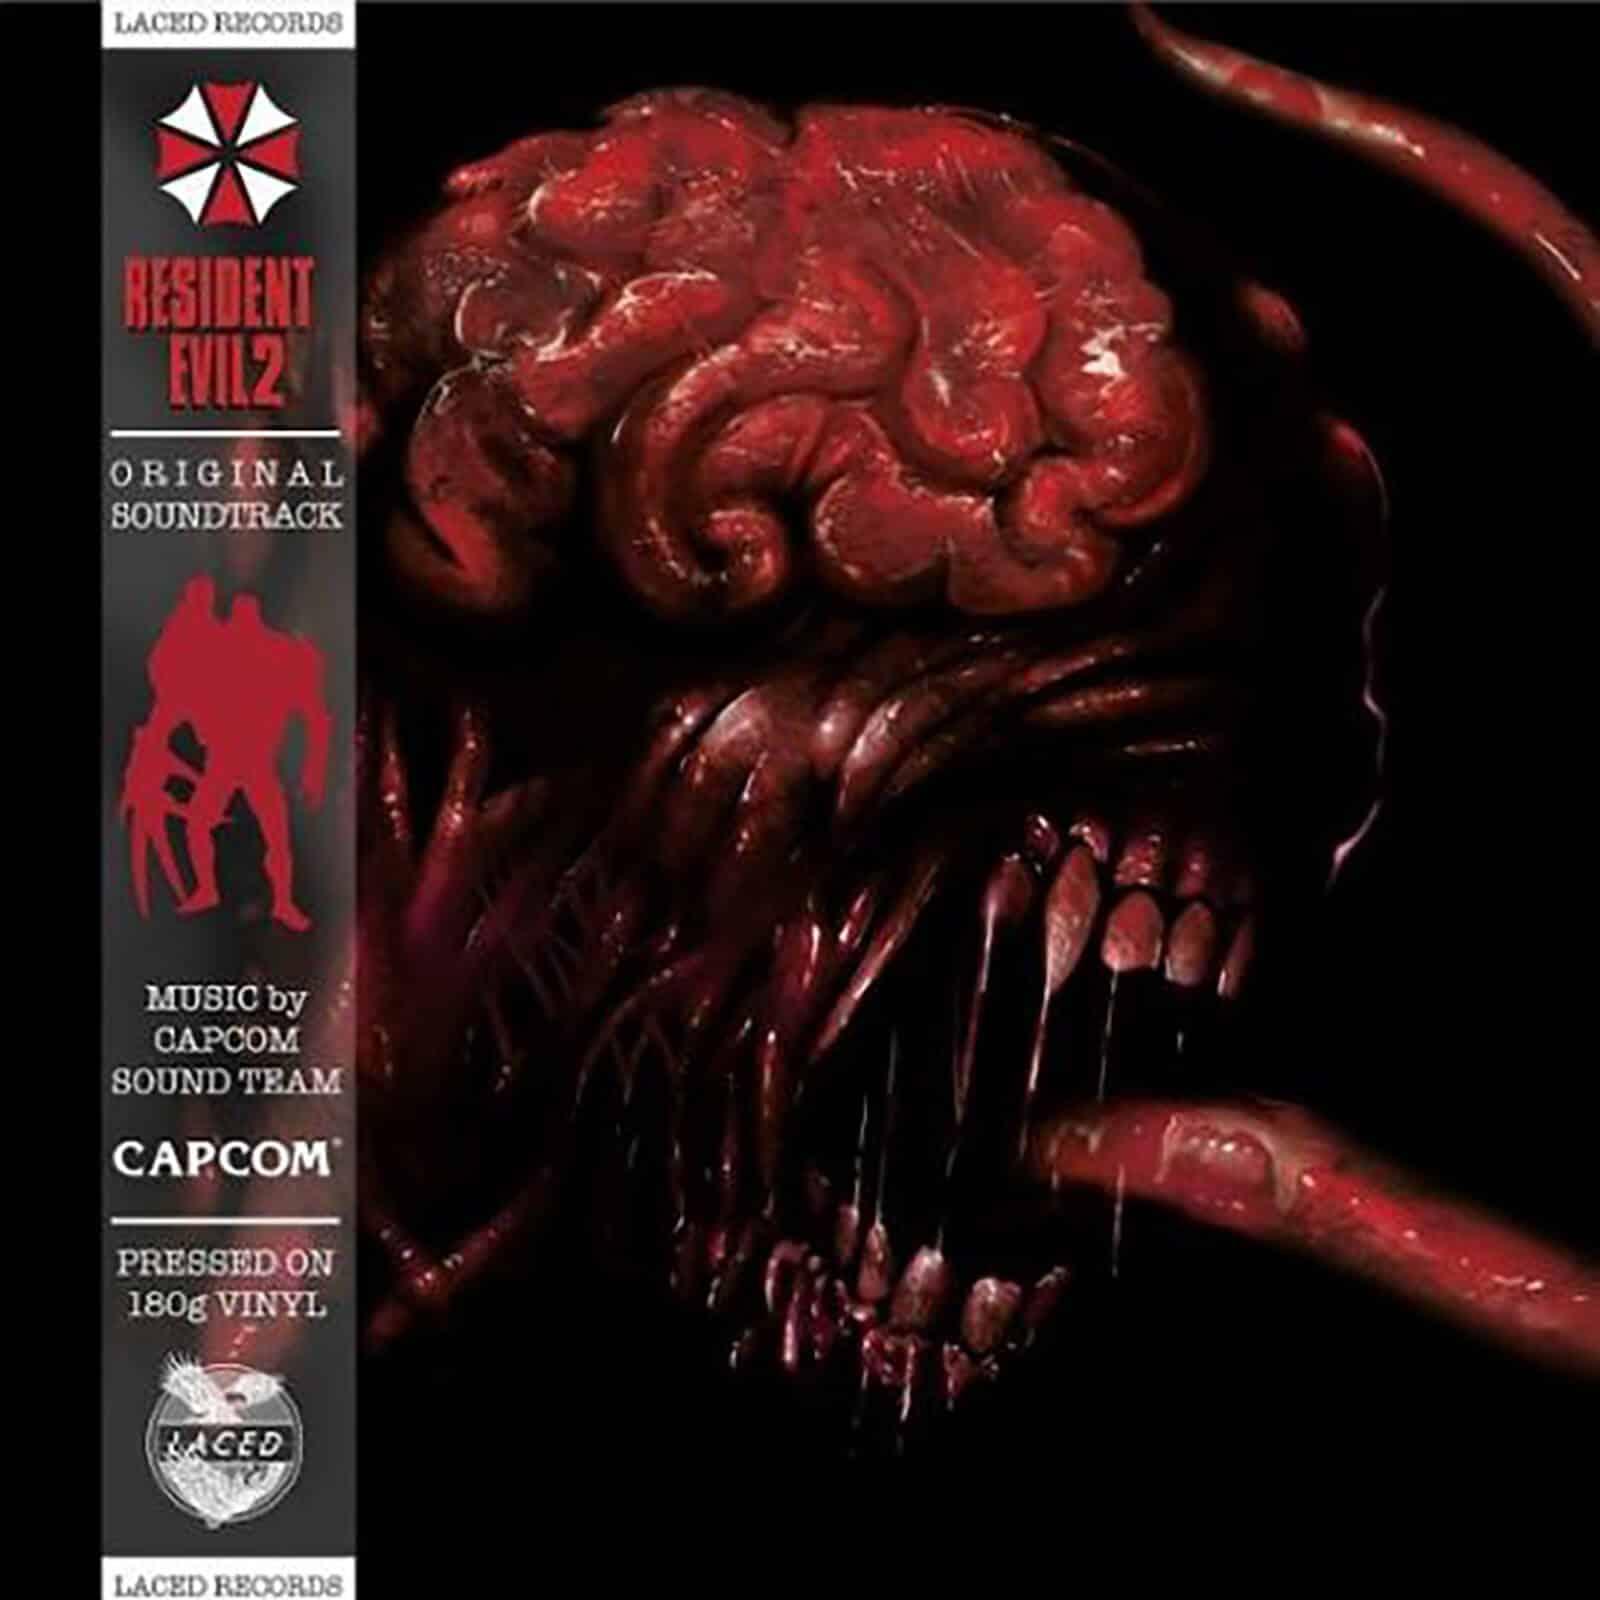 Laced Records - Resident Evil 2 (Original Soundtrack) 2xLP für 41,99€